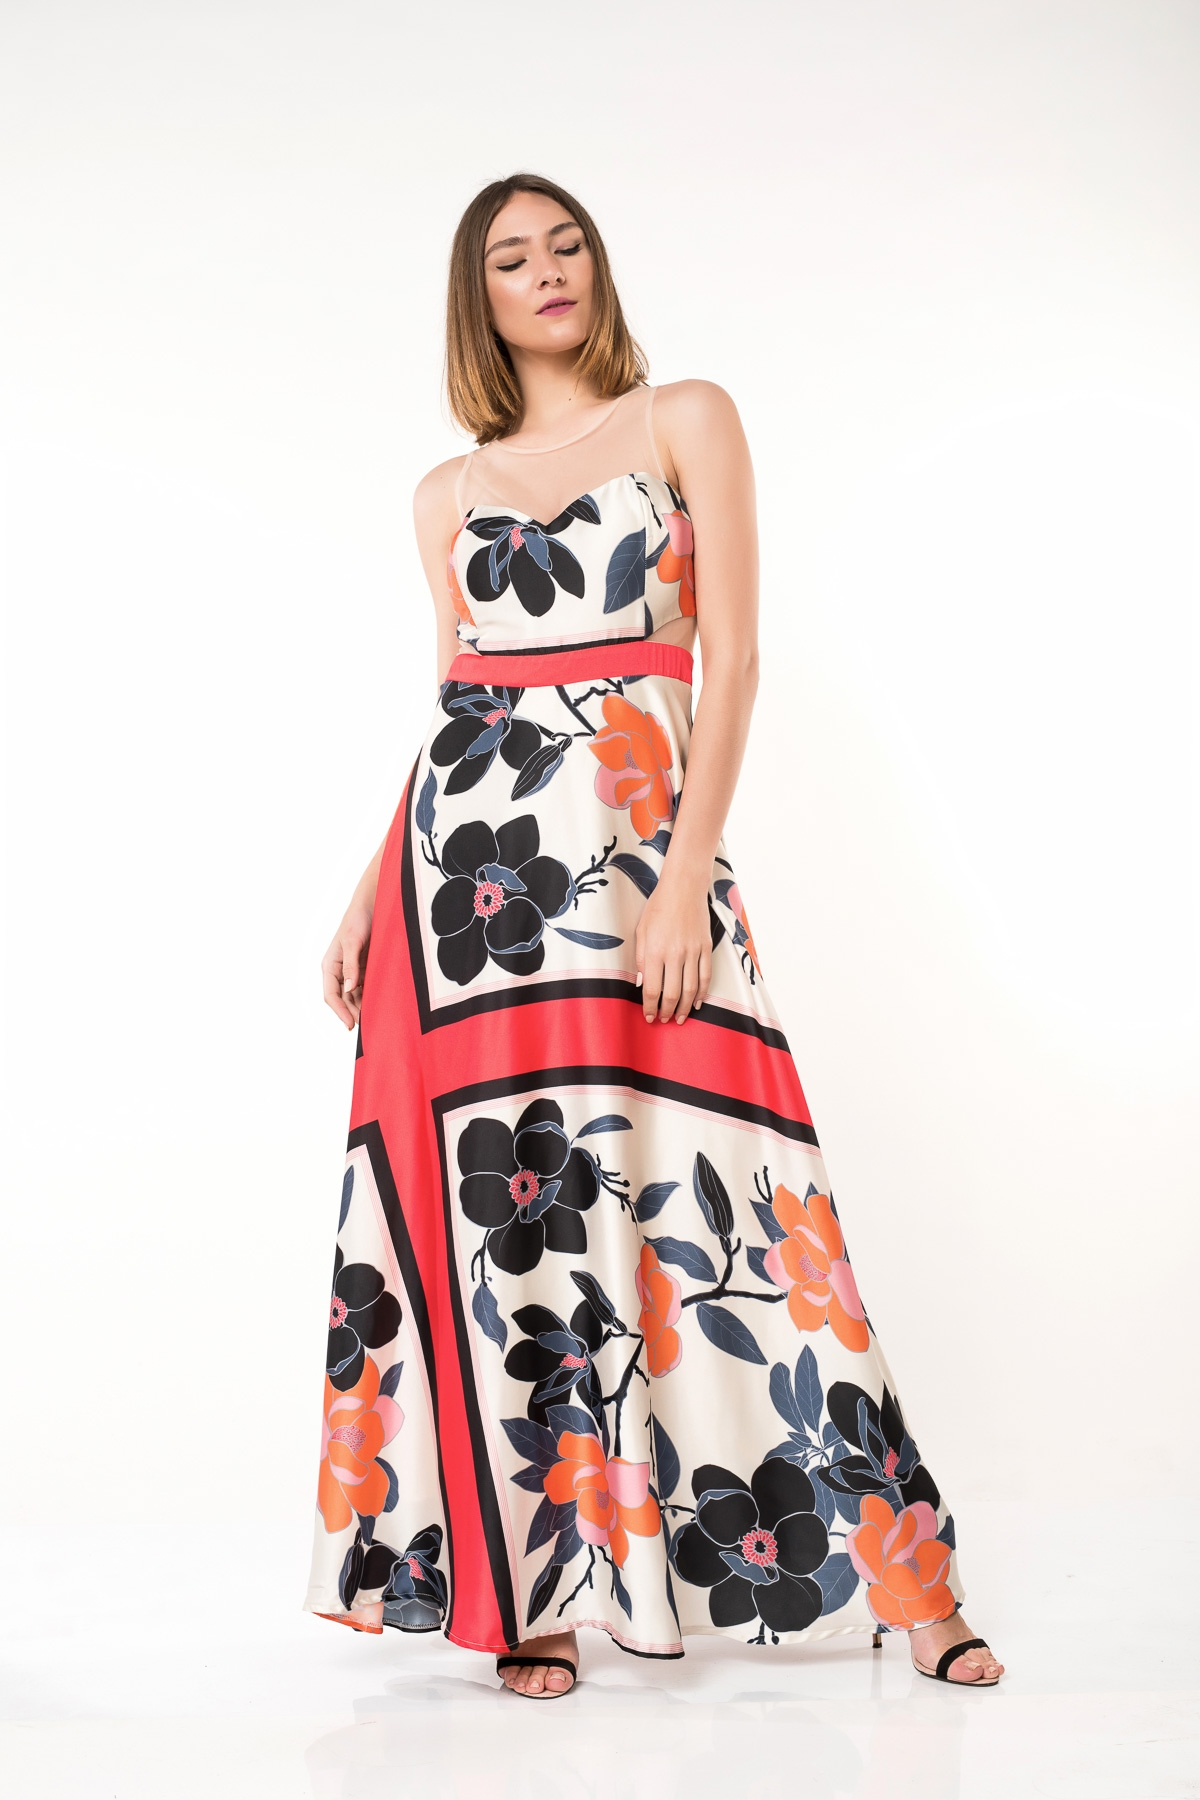 479ddea0334e Φόρεμα κοραλί μπεζ floral maxi με διαφάνεια